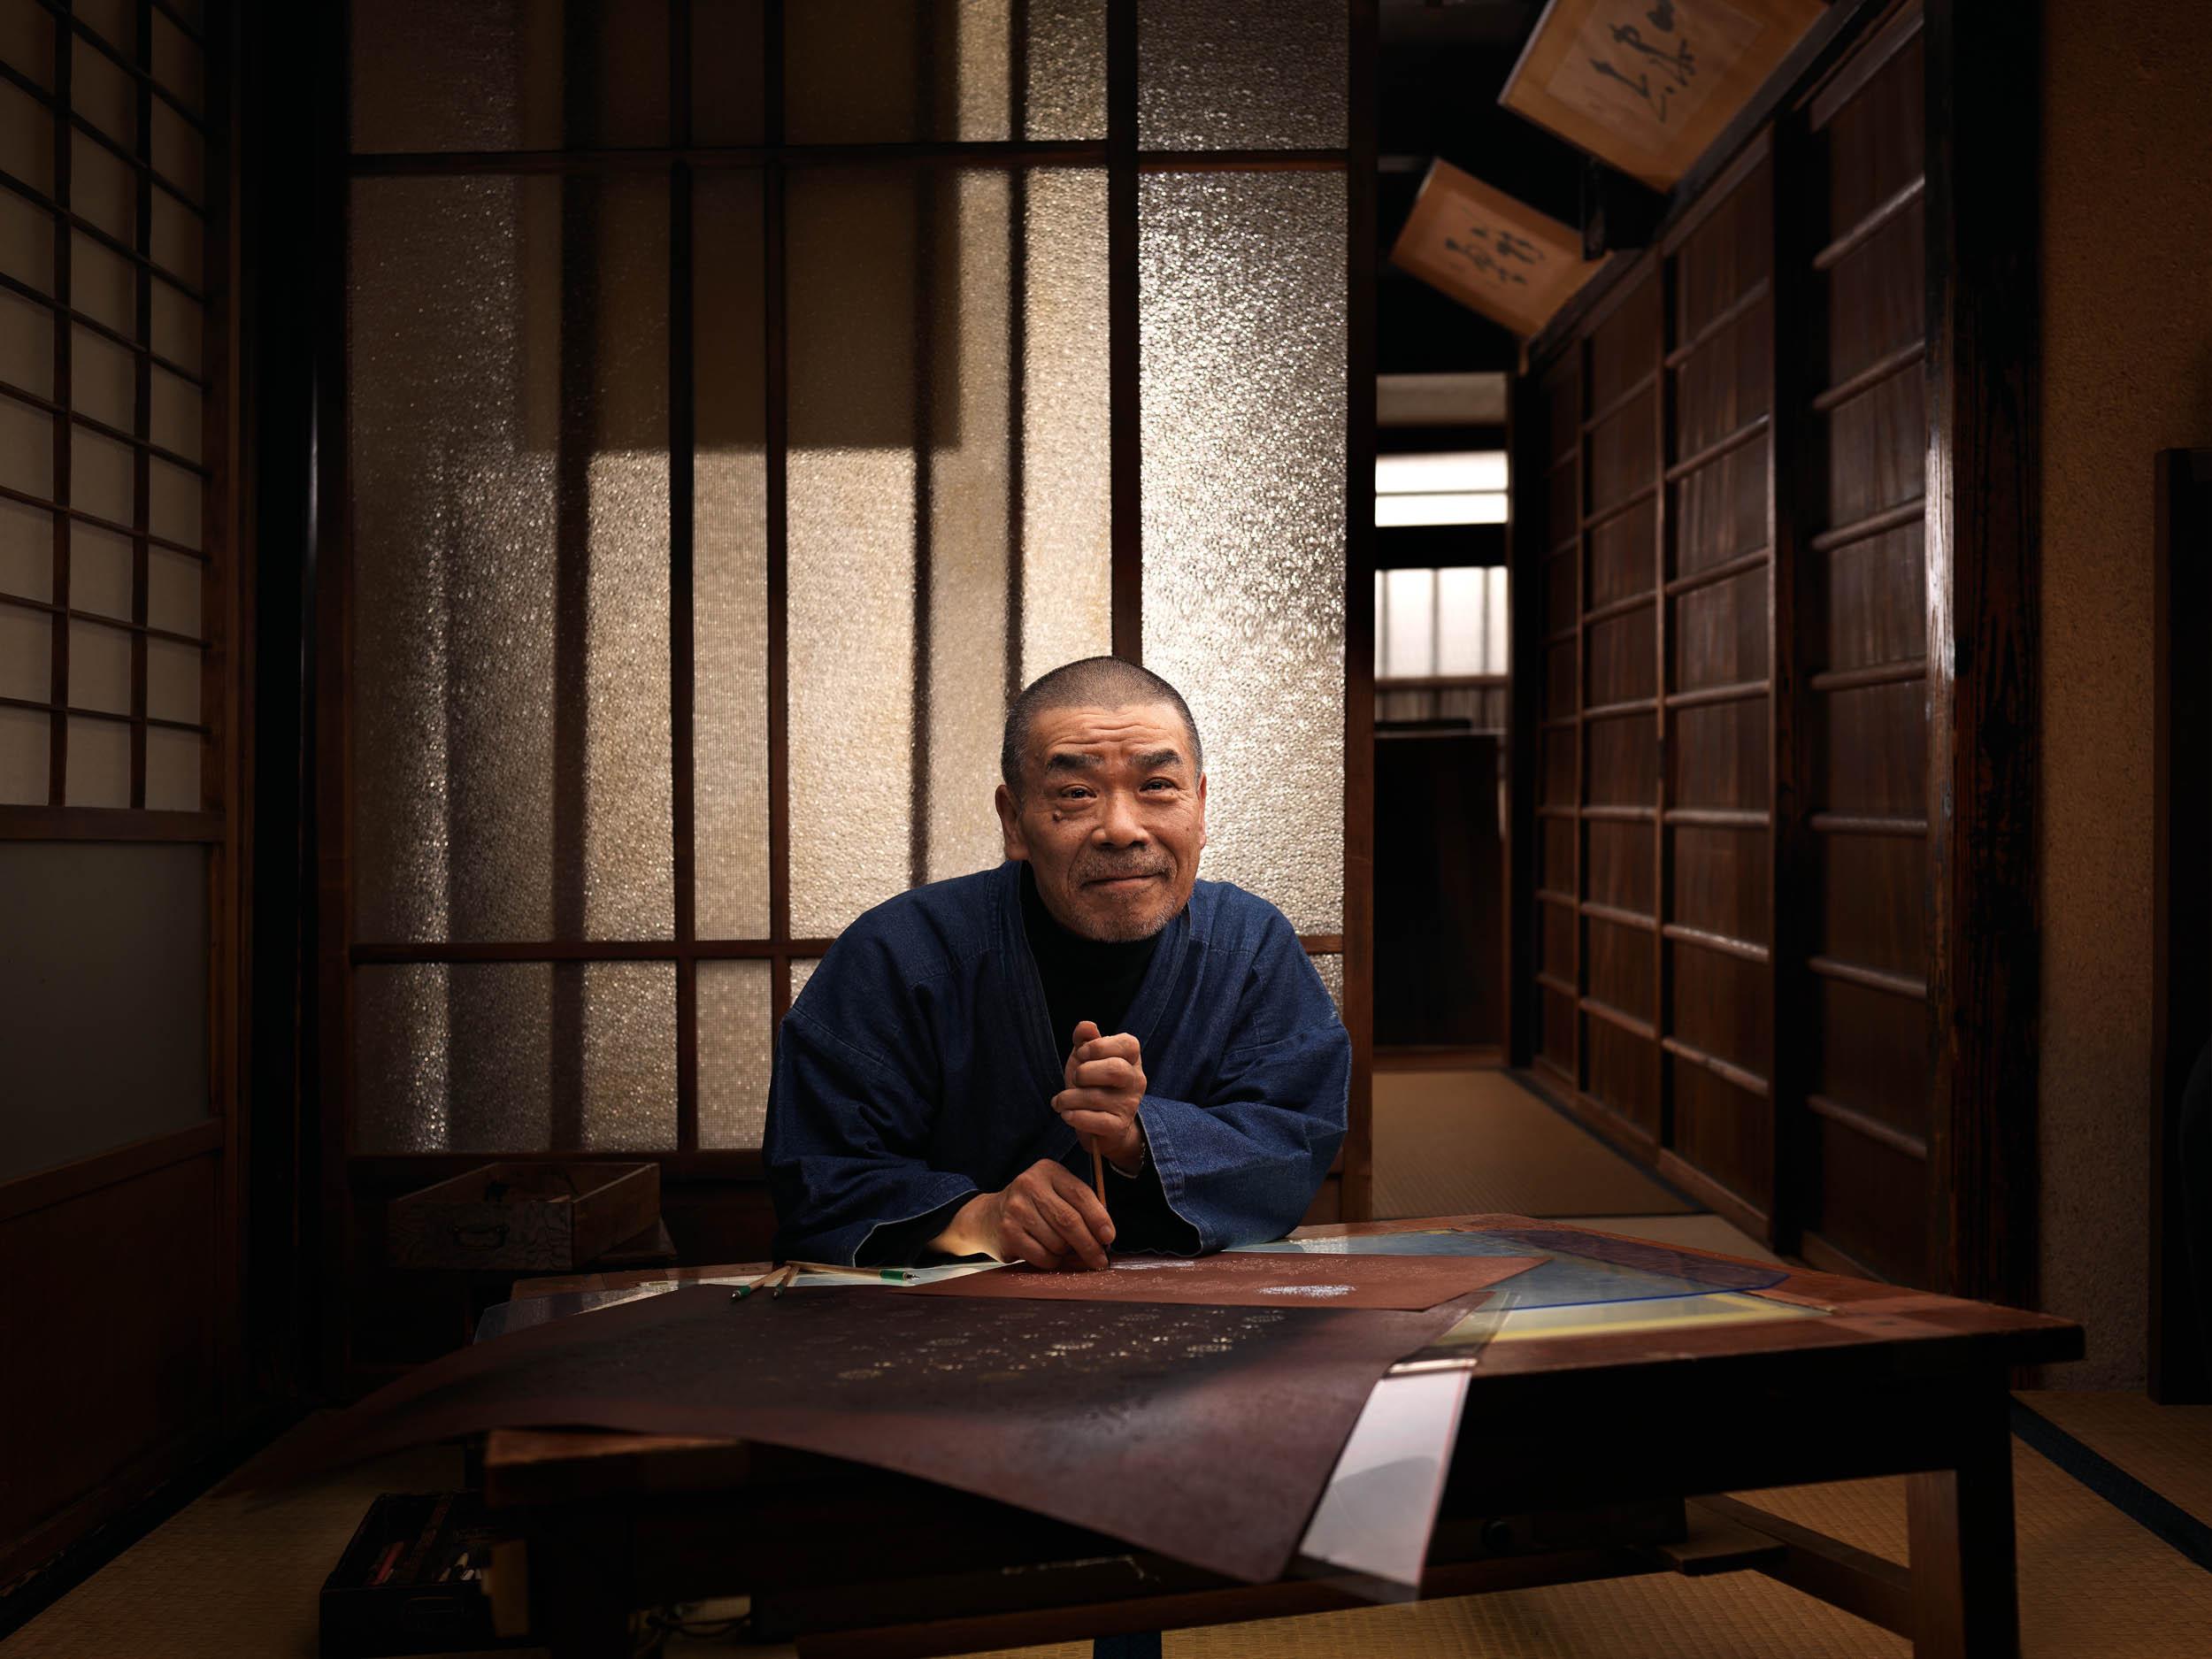 Takeshi Nishimura